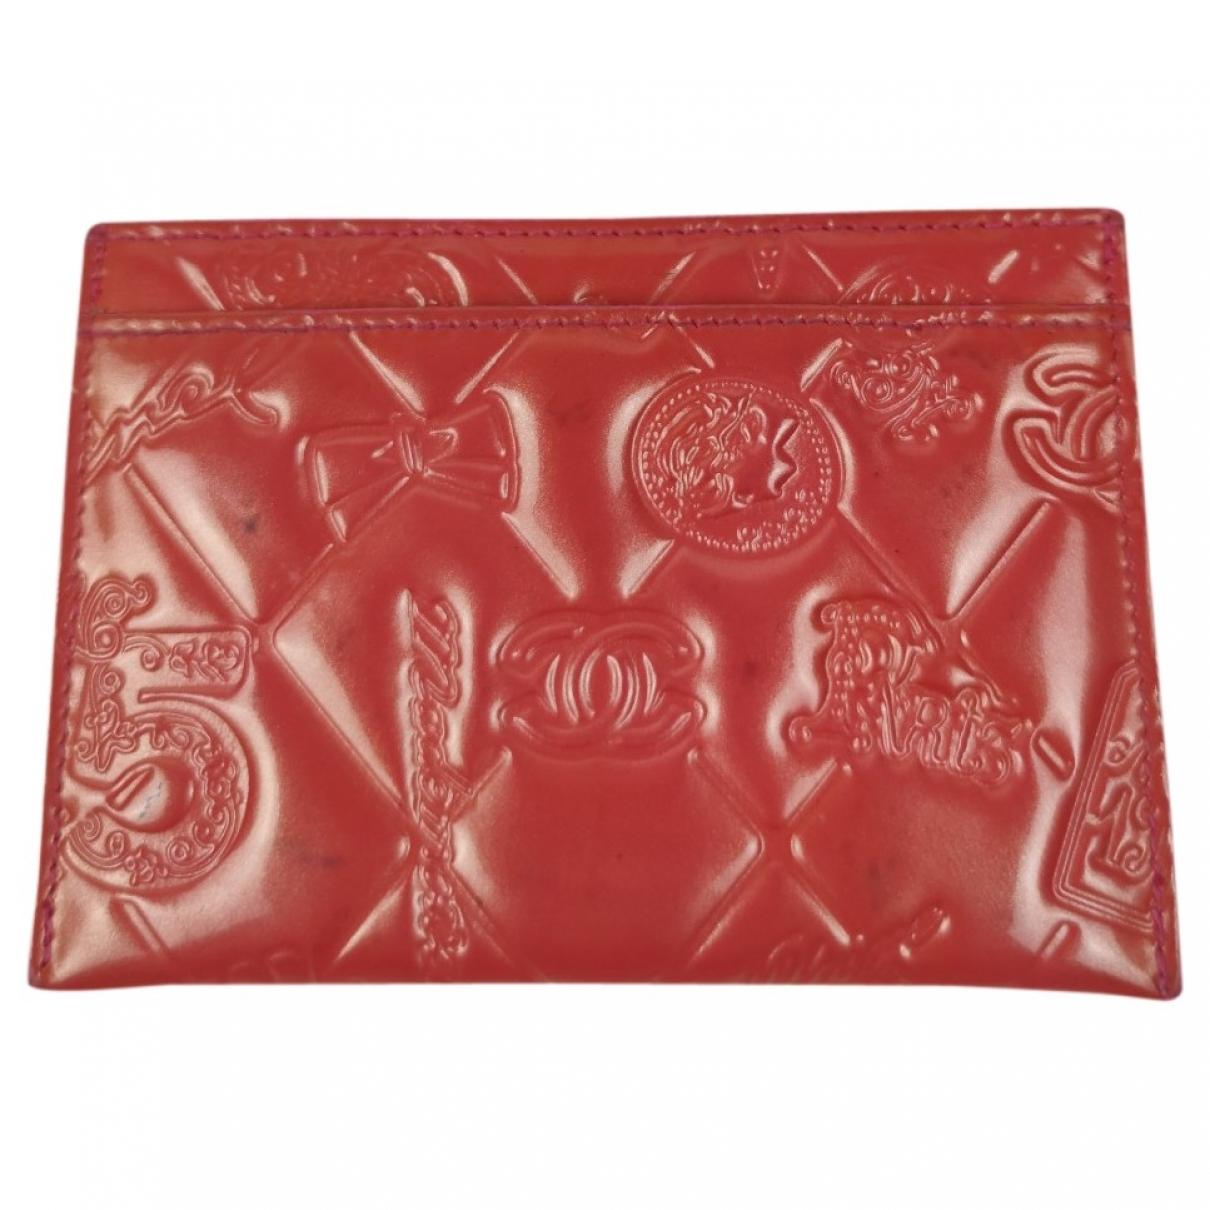 Chanel \N Kleinlederwaren in  Rot Lackleder